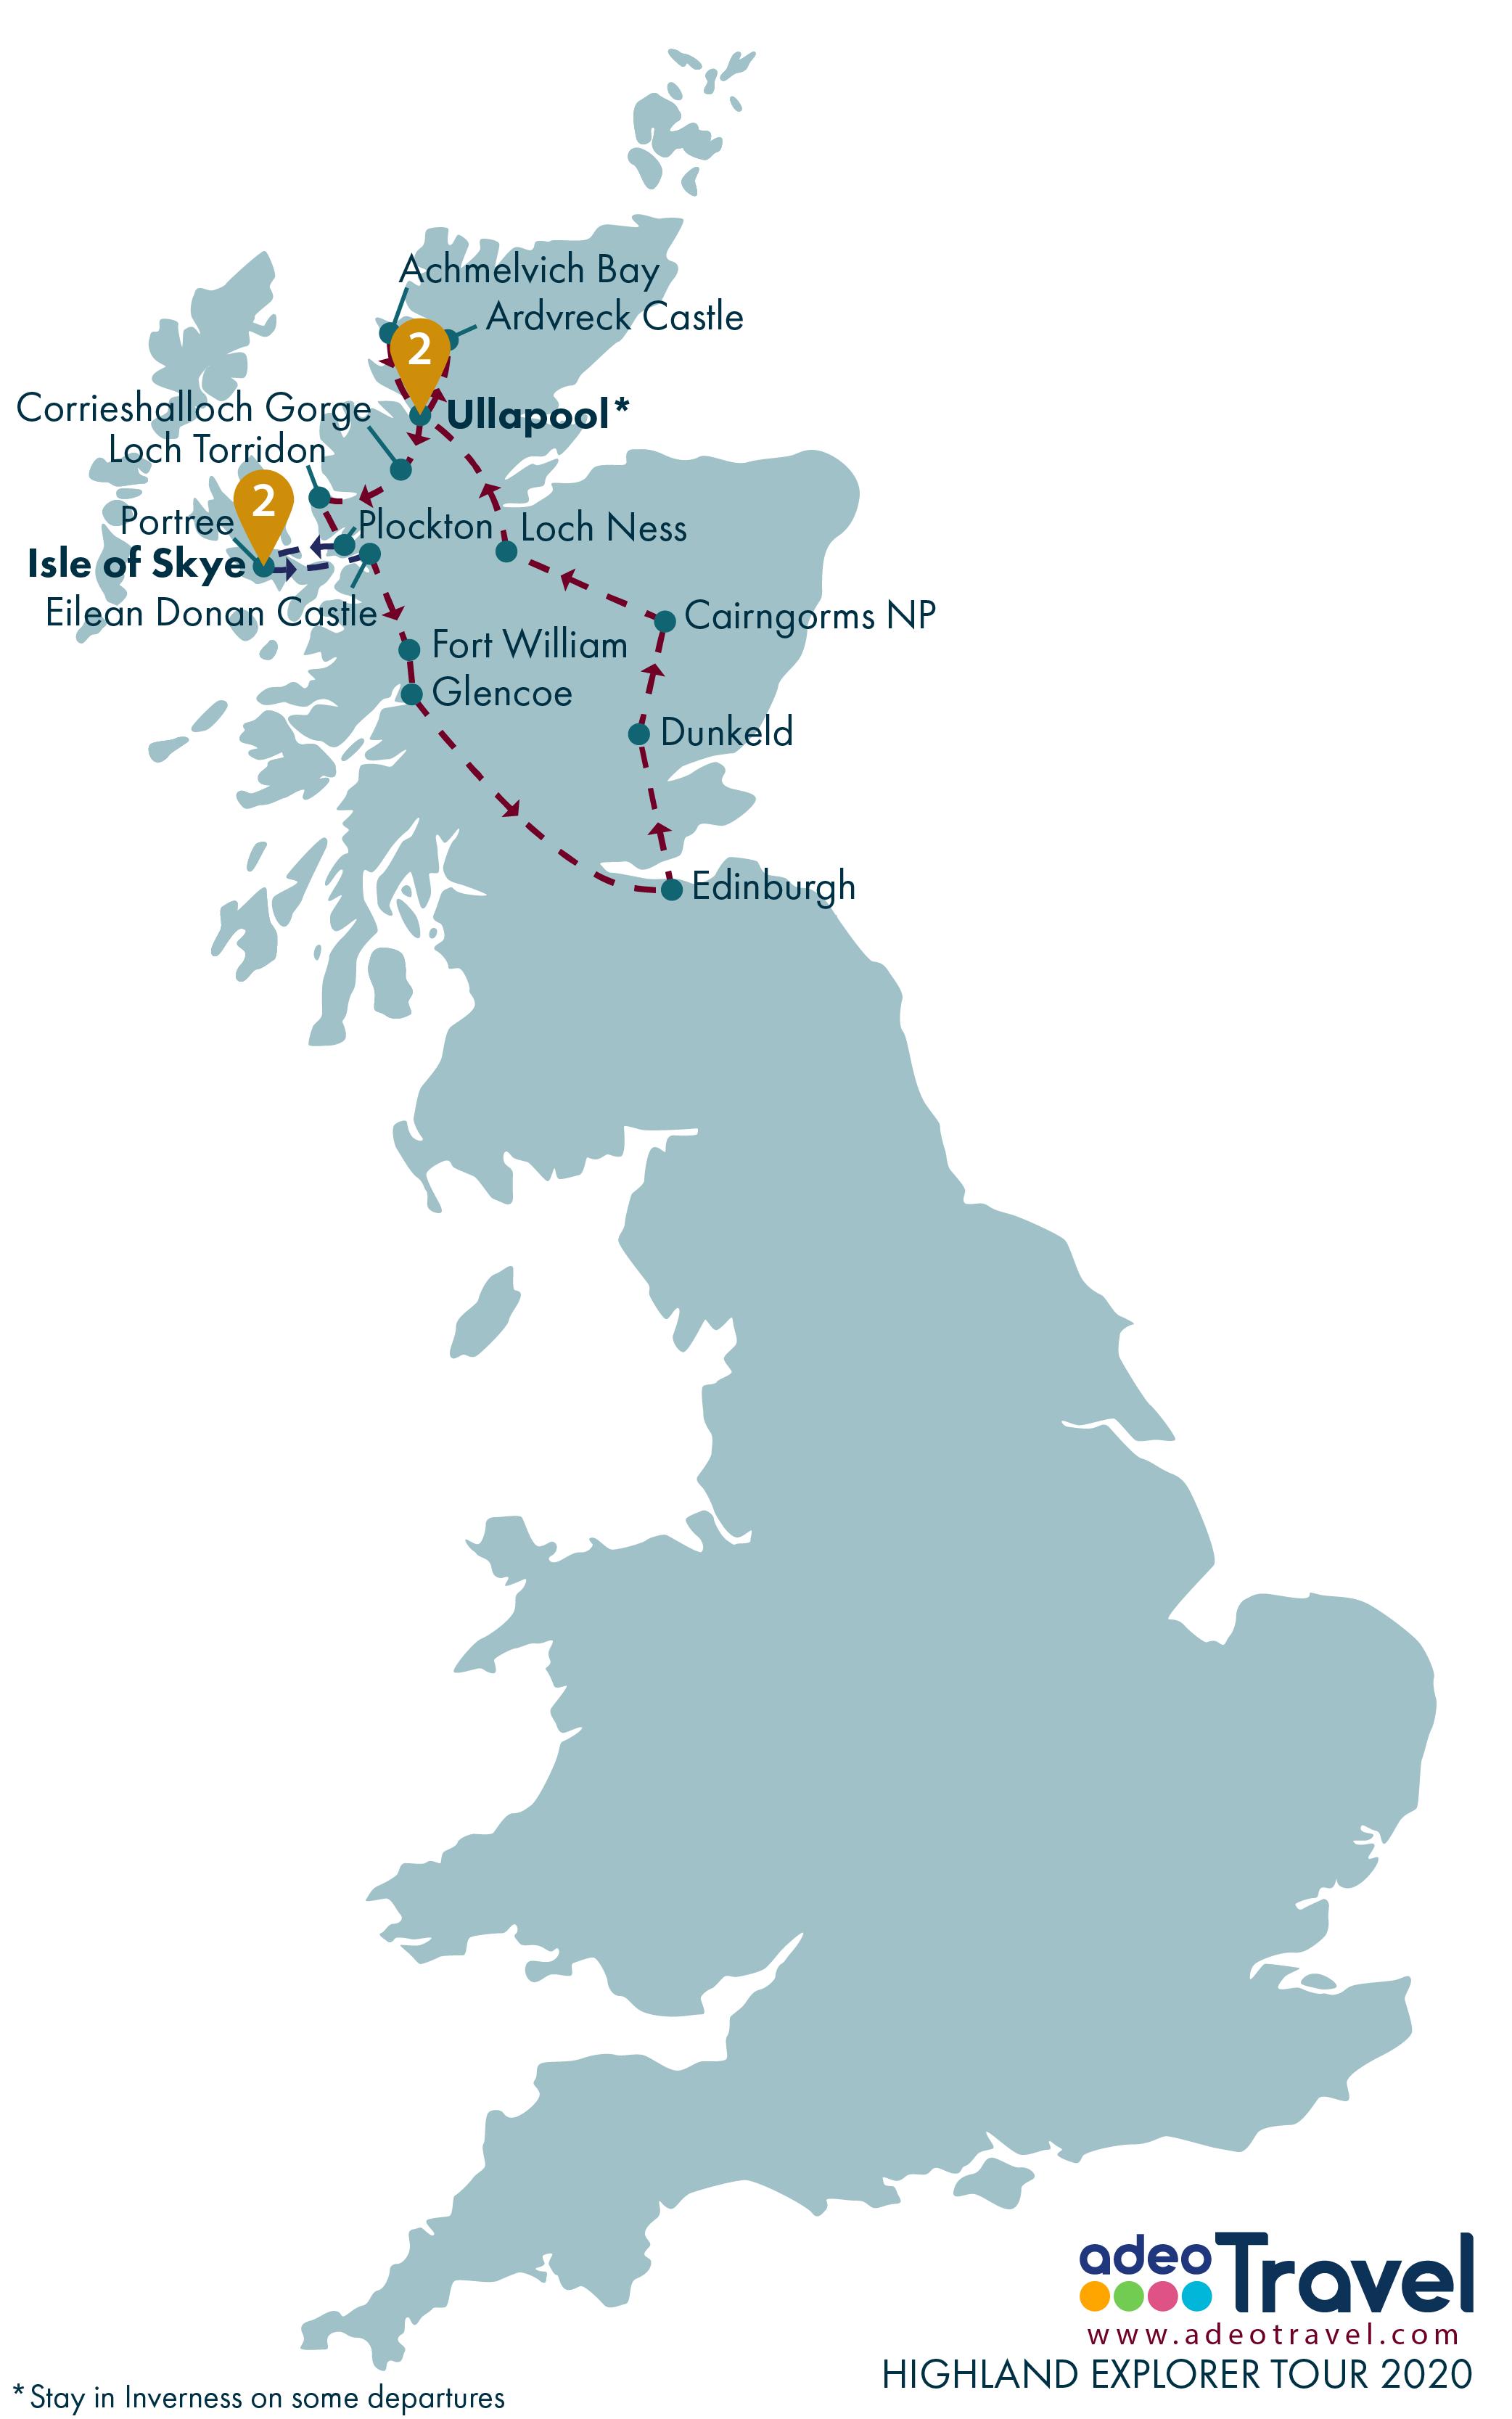 Map - Highland Explorer Tour 2020